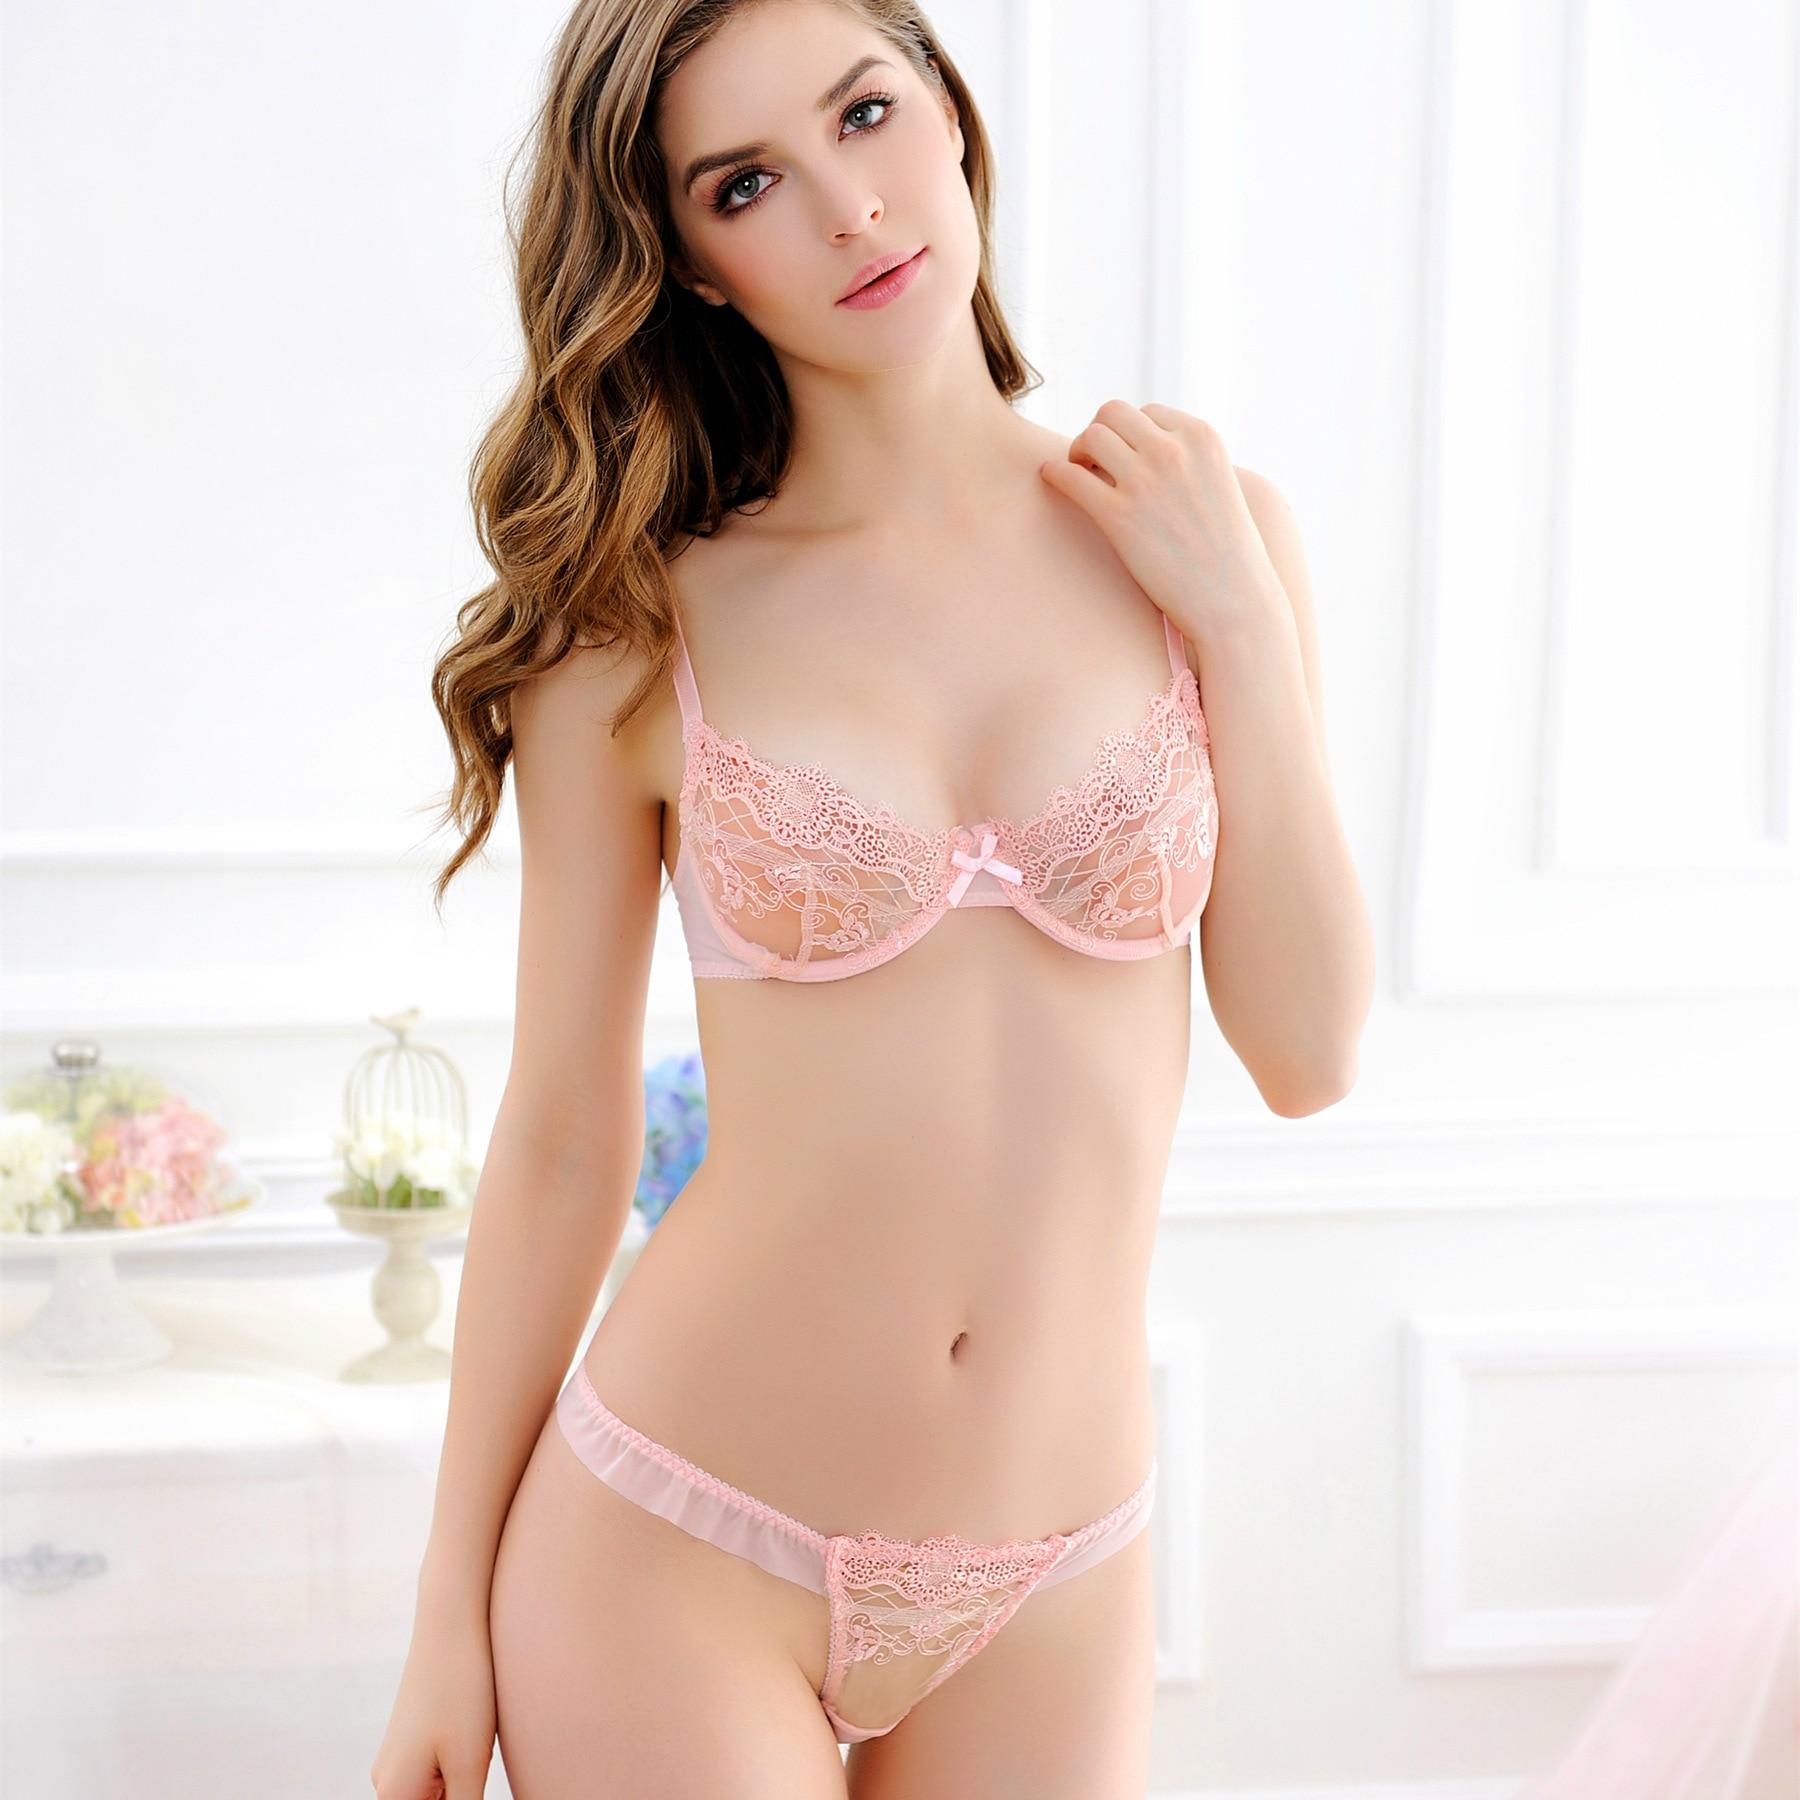 Hot beads seamless bra set sexy lingerie underwear sets for women